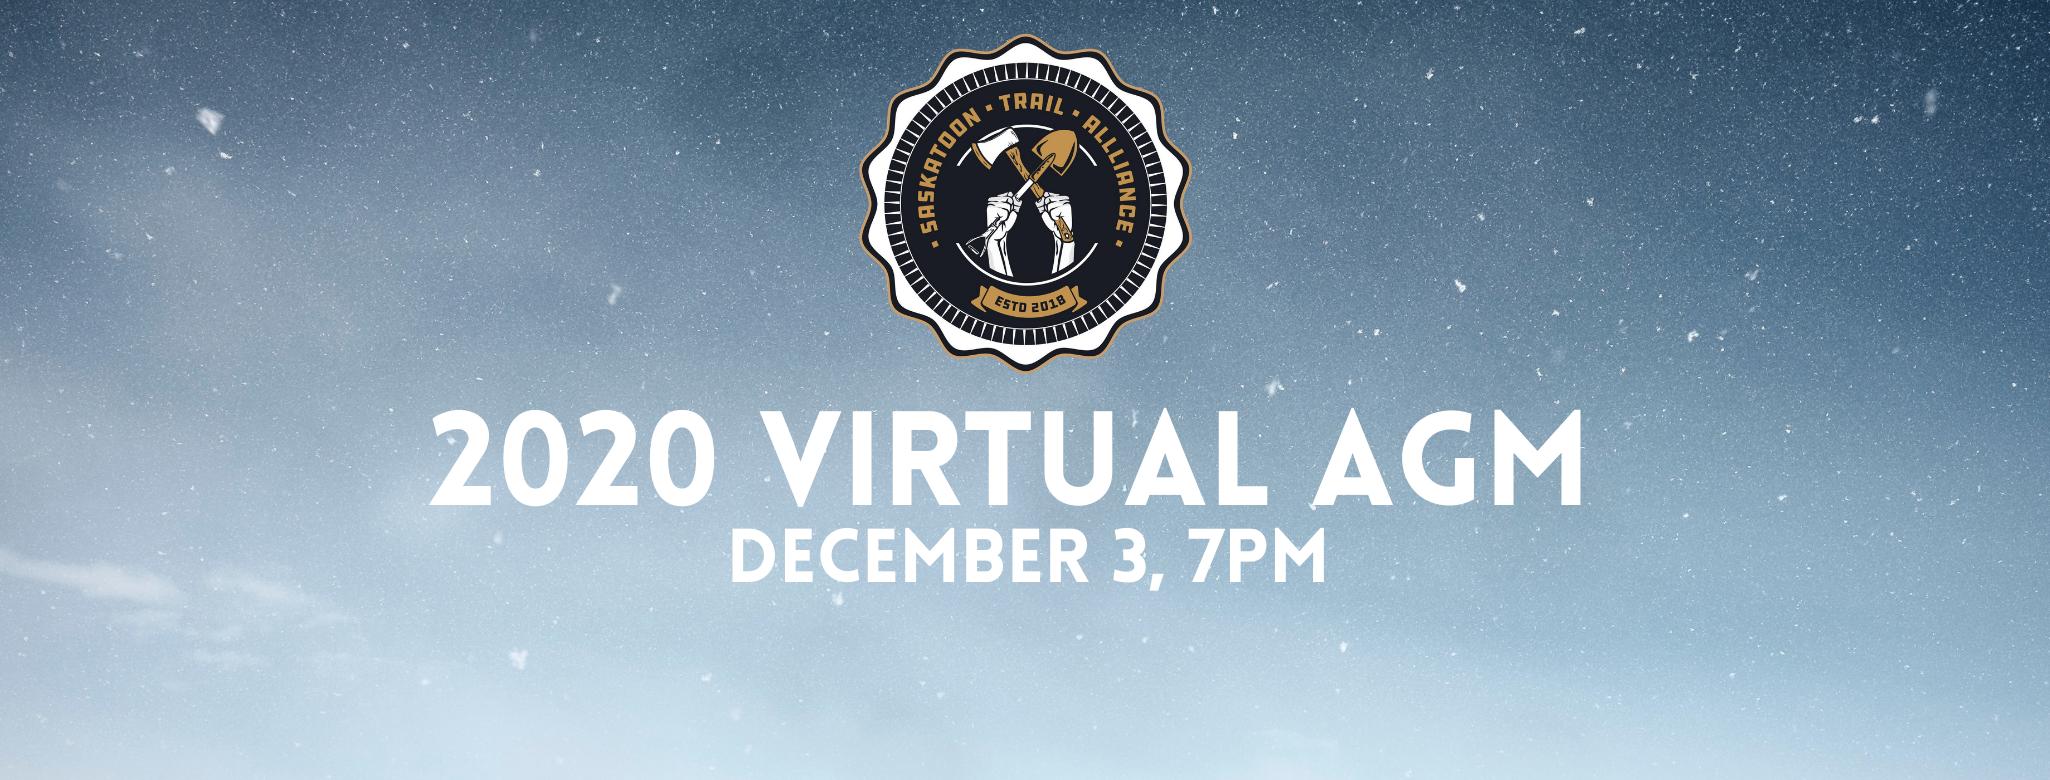 2020 Virtual AGM – December 3